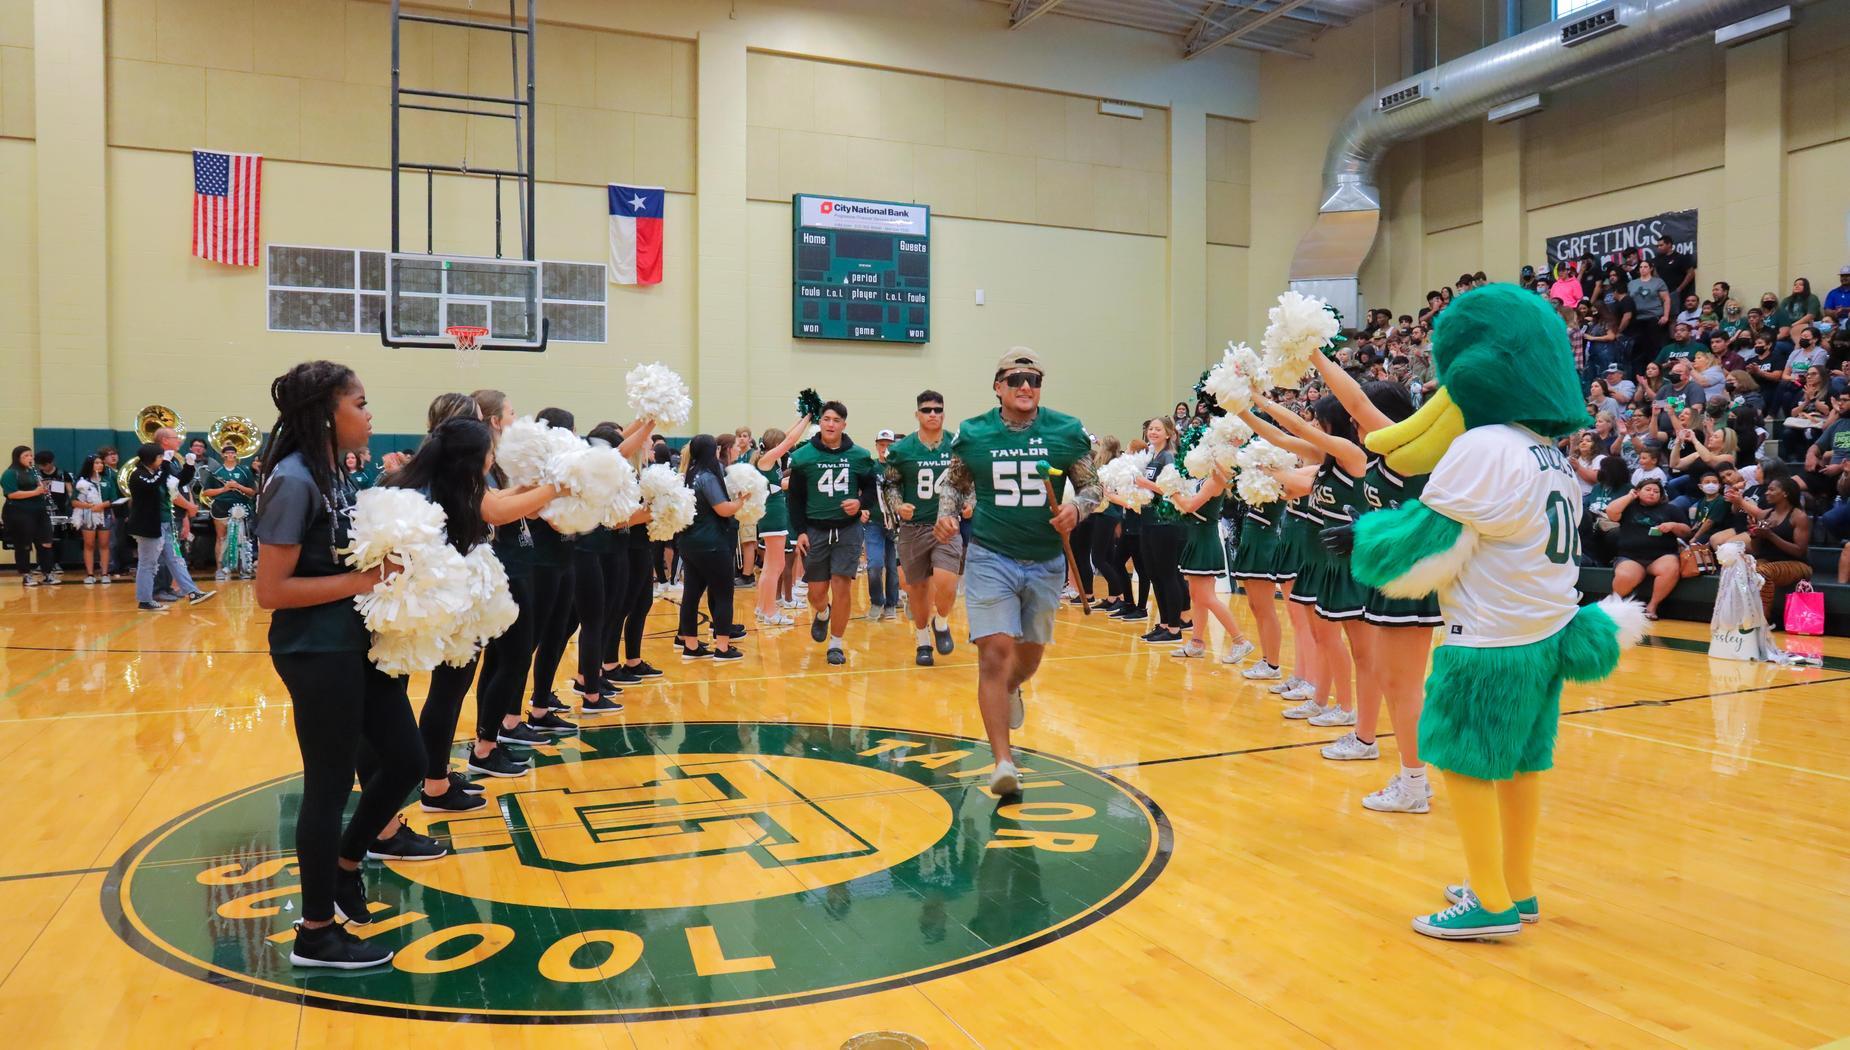 Football Team enters pep rally